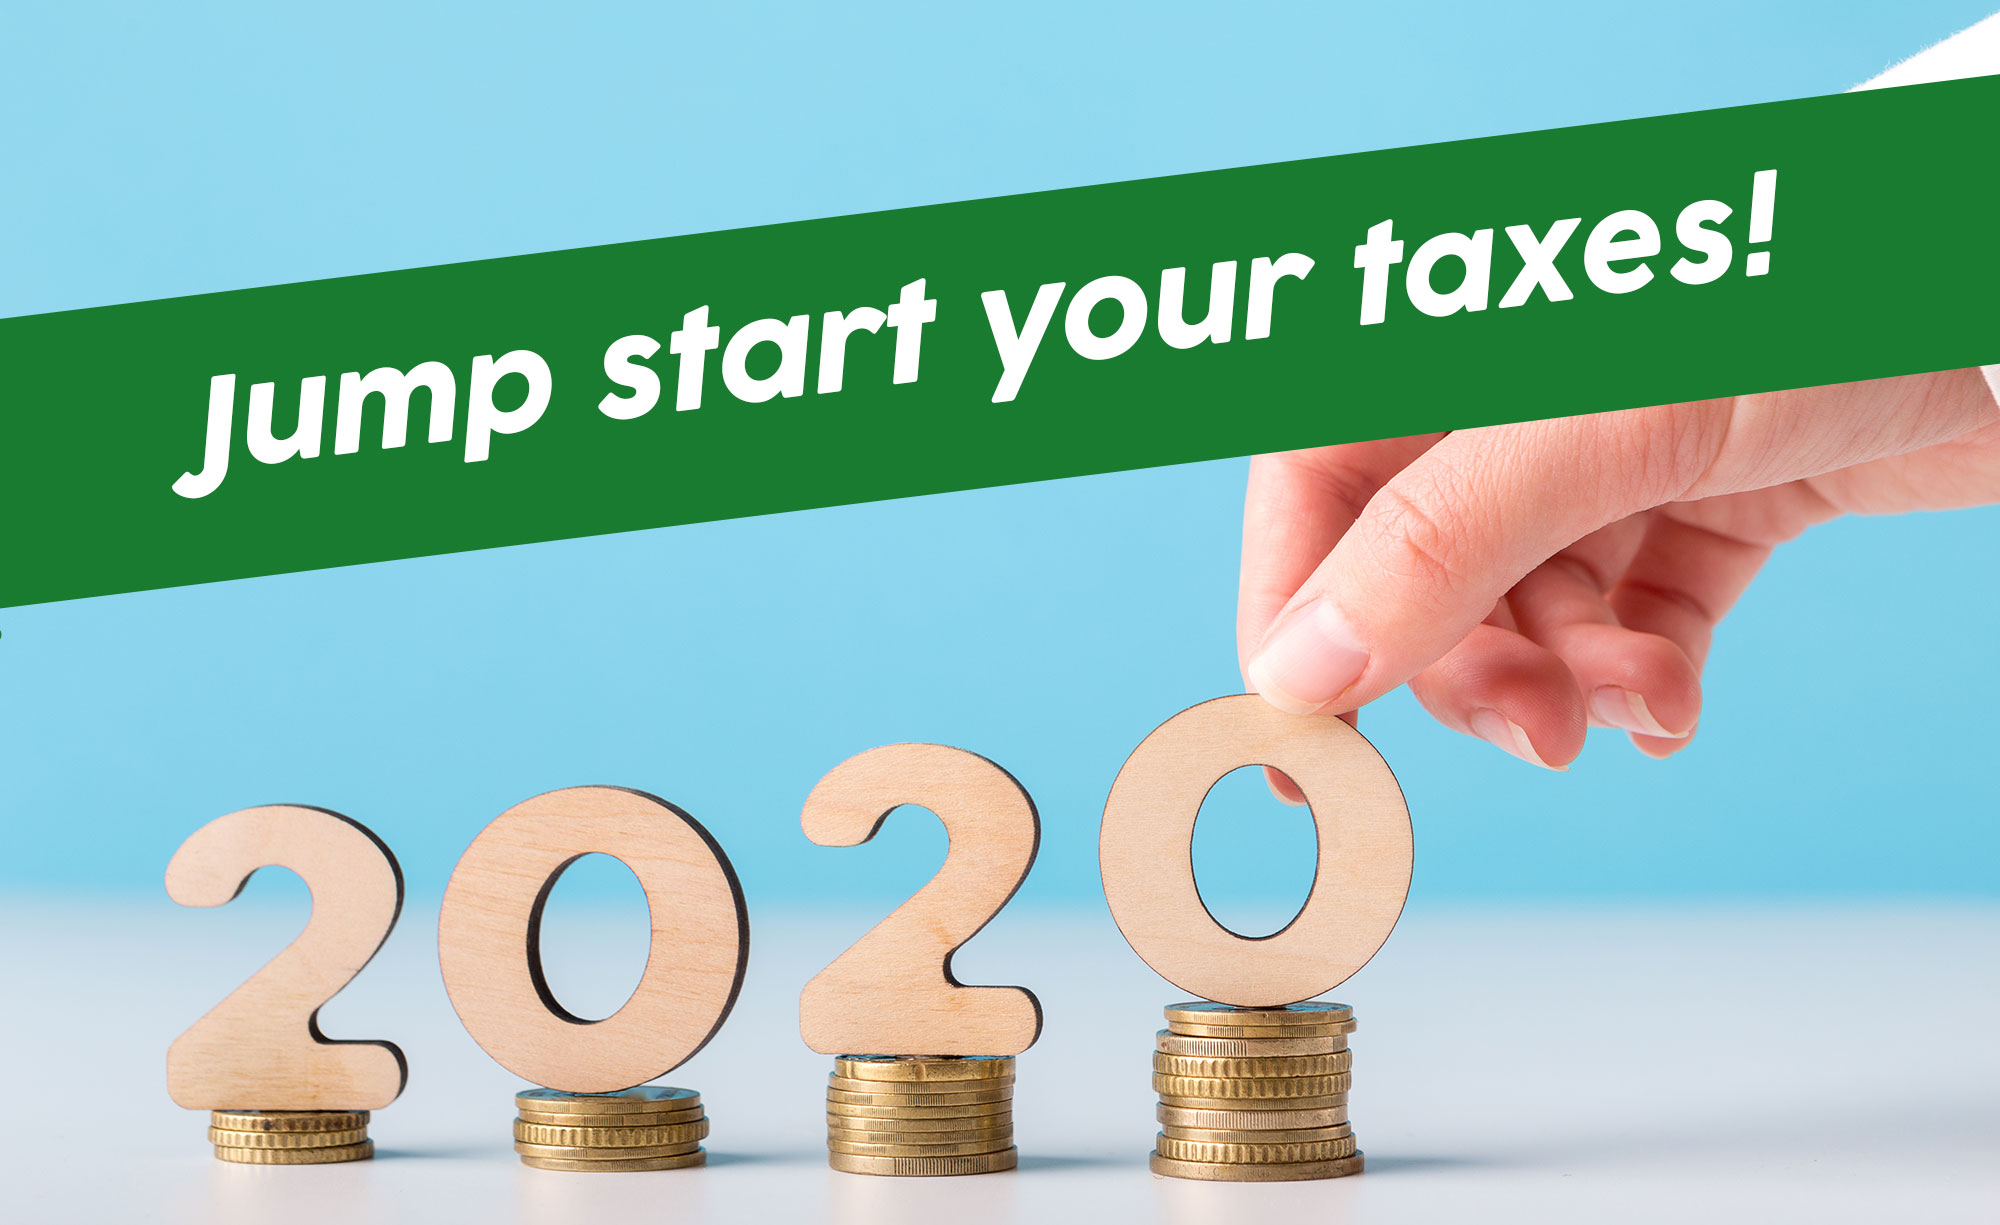 jump start your taxes